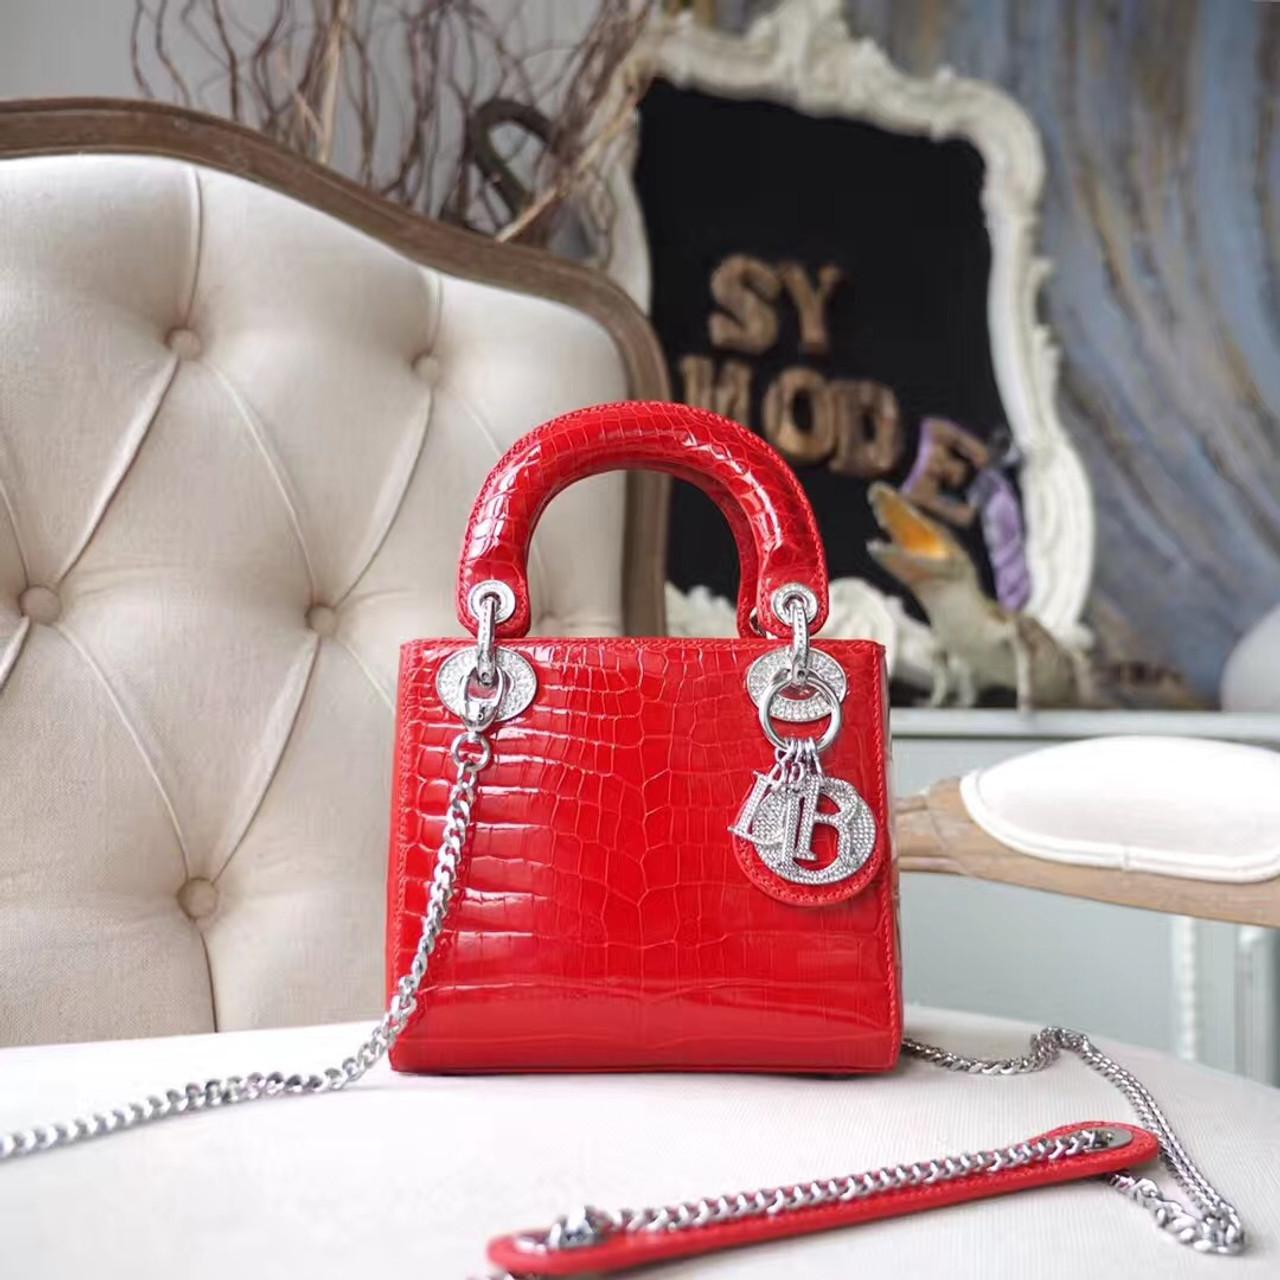 566f5a9a1a0f Christian Dior Mini Lady Dior 17cm Bag Shiny Niloticus Crocodile Skin  Silver Hardware